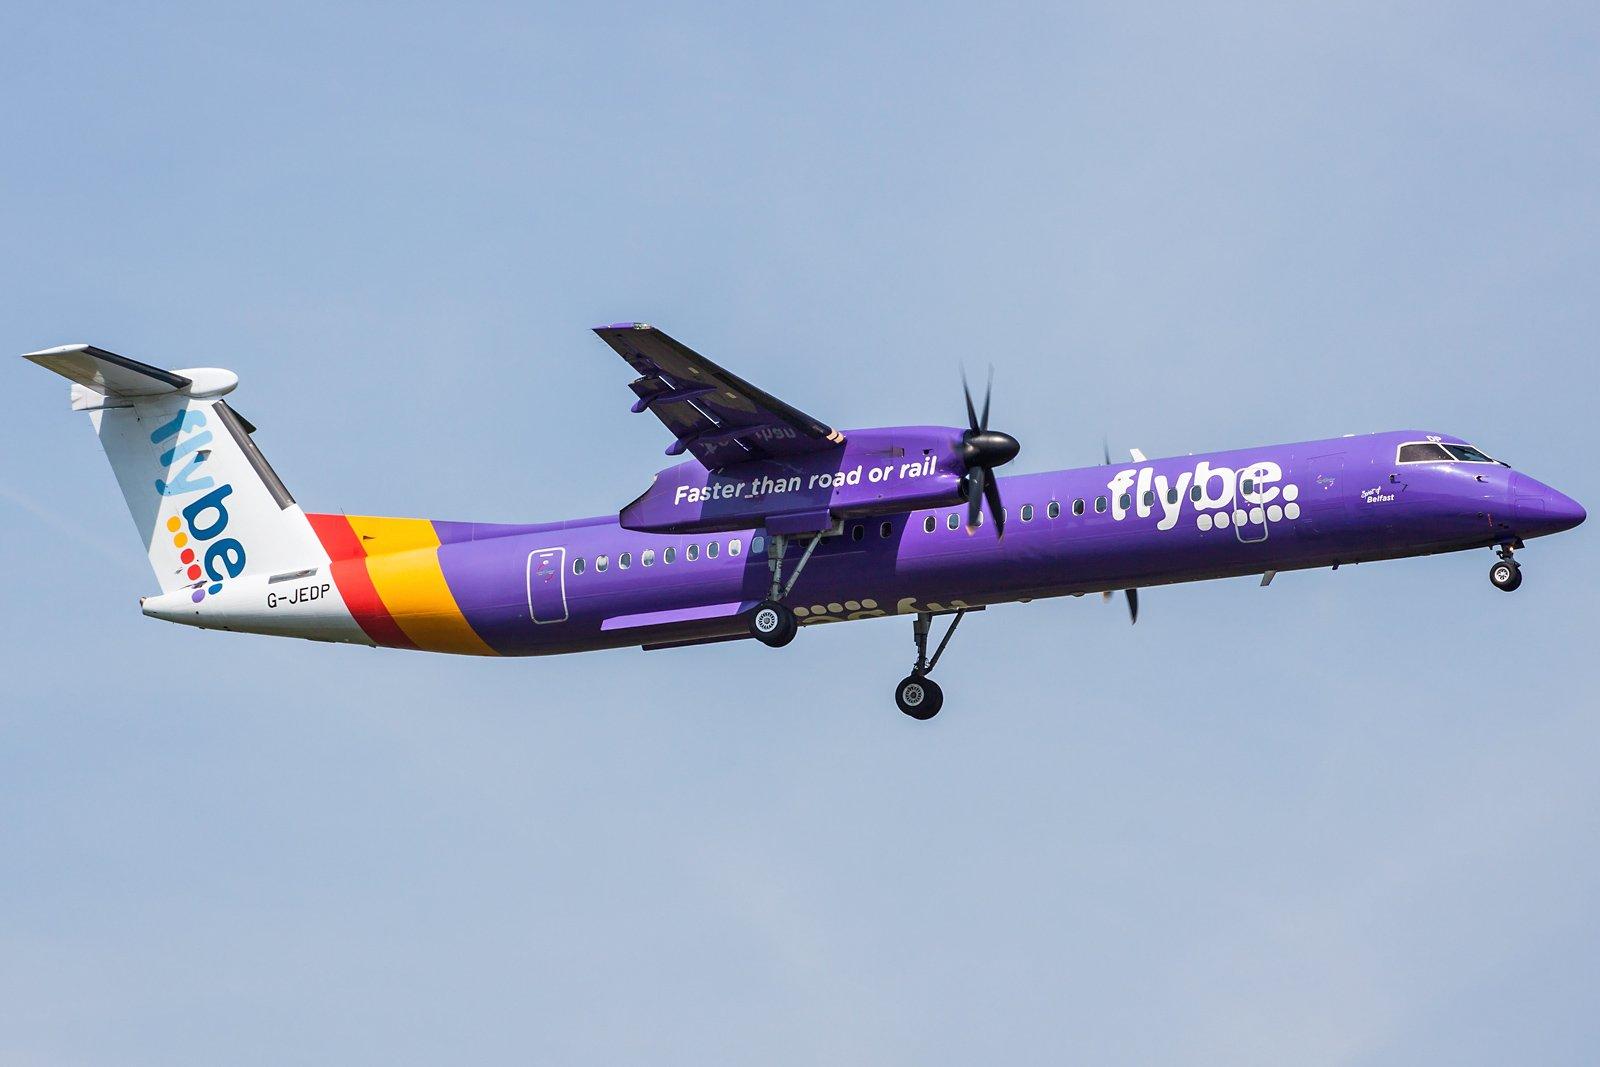 Flybe De Havilland Canada DHC-8-402Q Dash 8 G-JEDP